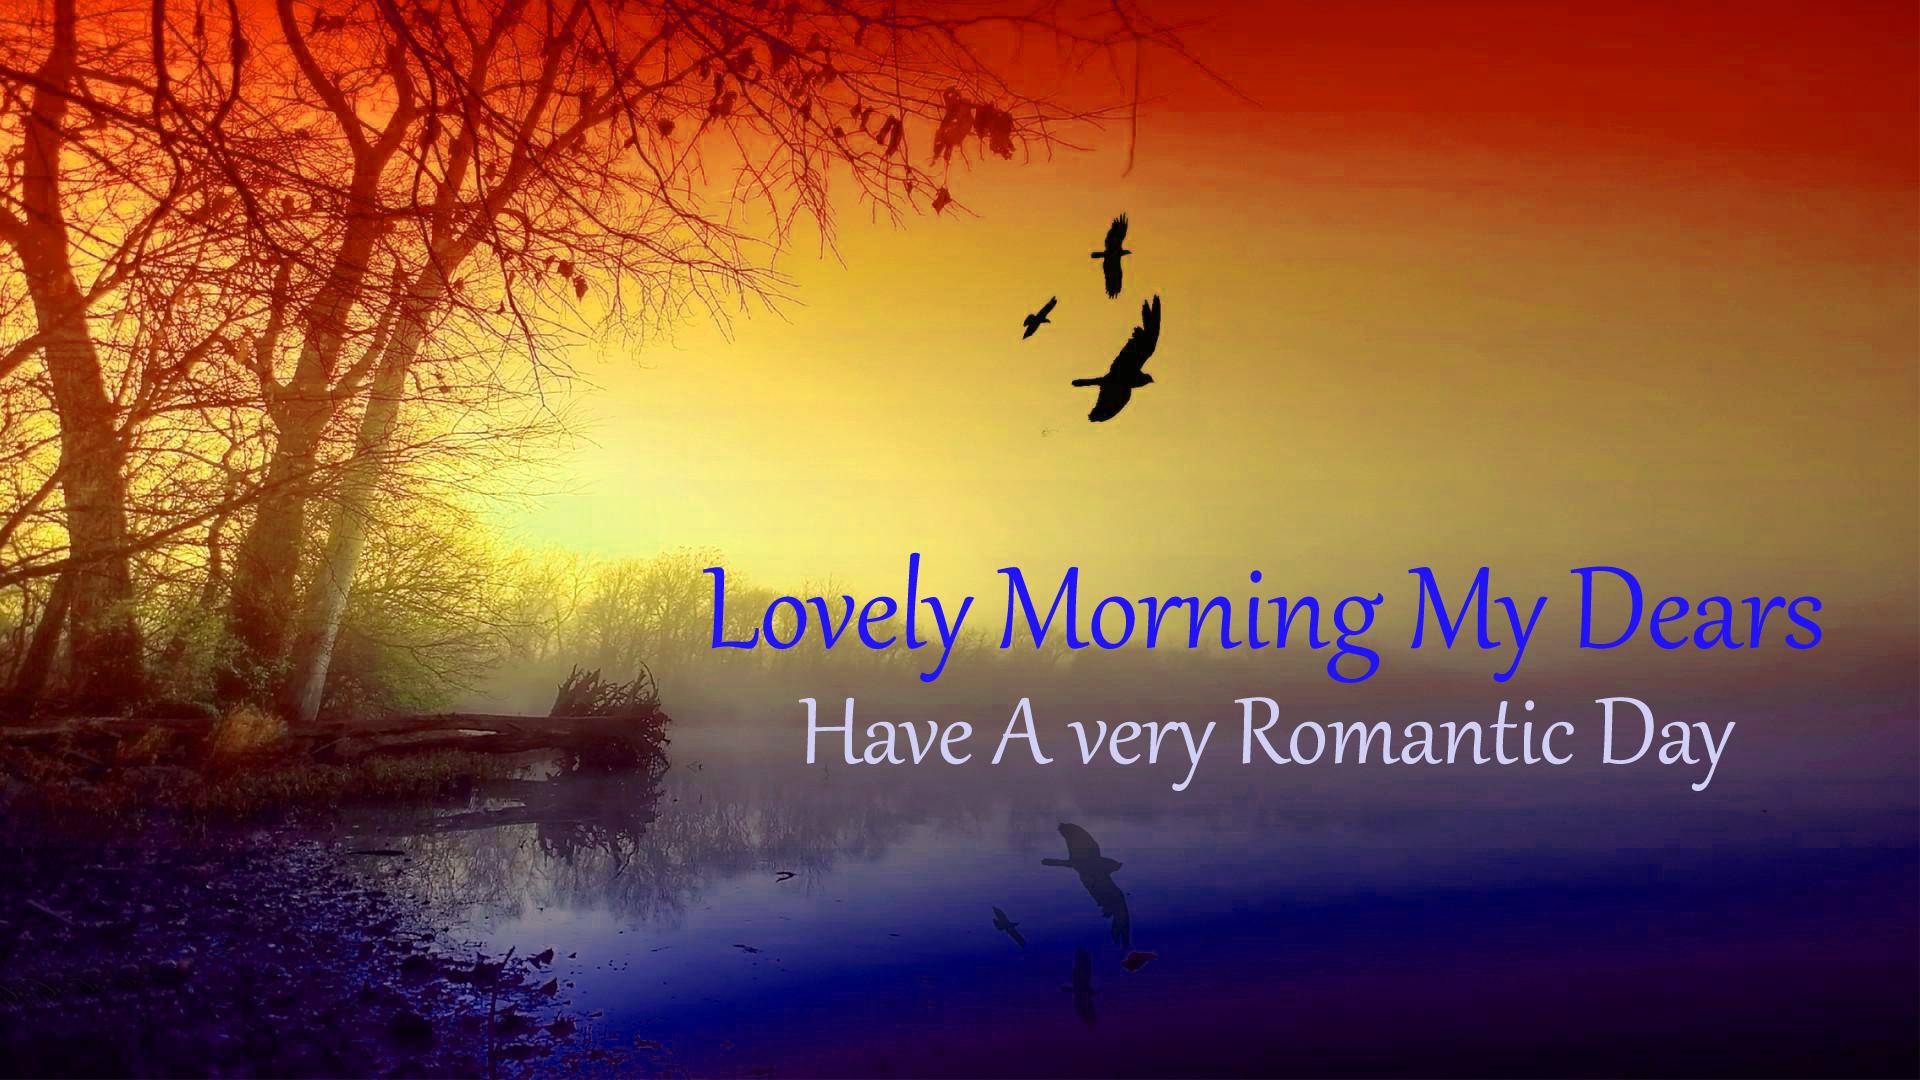 Romantic Good Morning Quotes: Romantic Good Morning Beautiful Quotes. QuotesGram